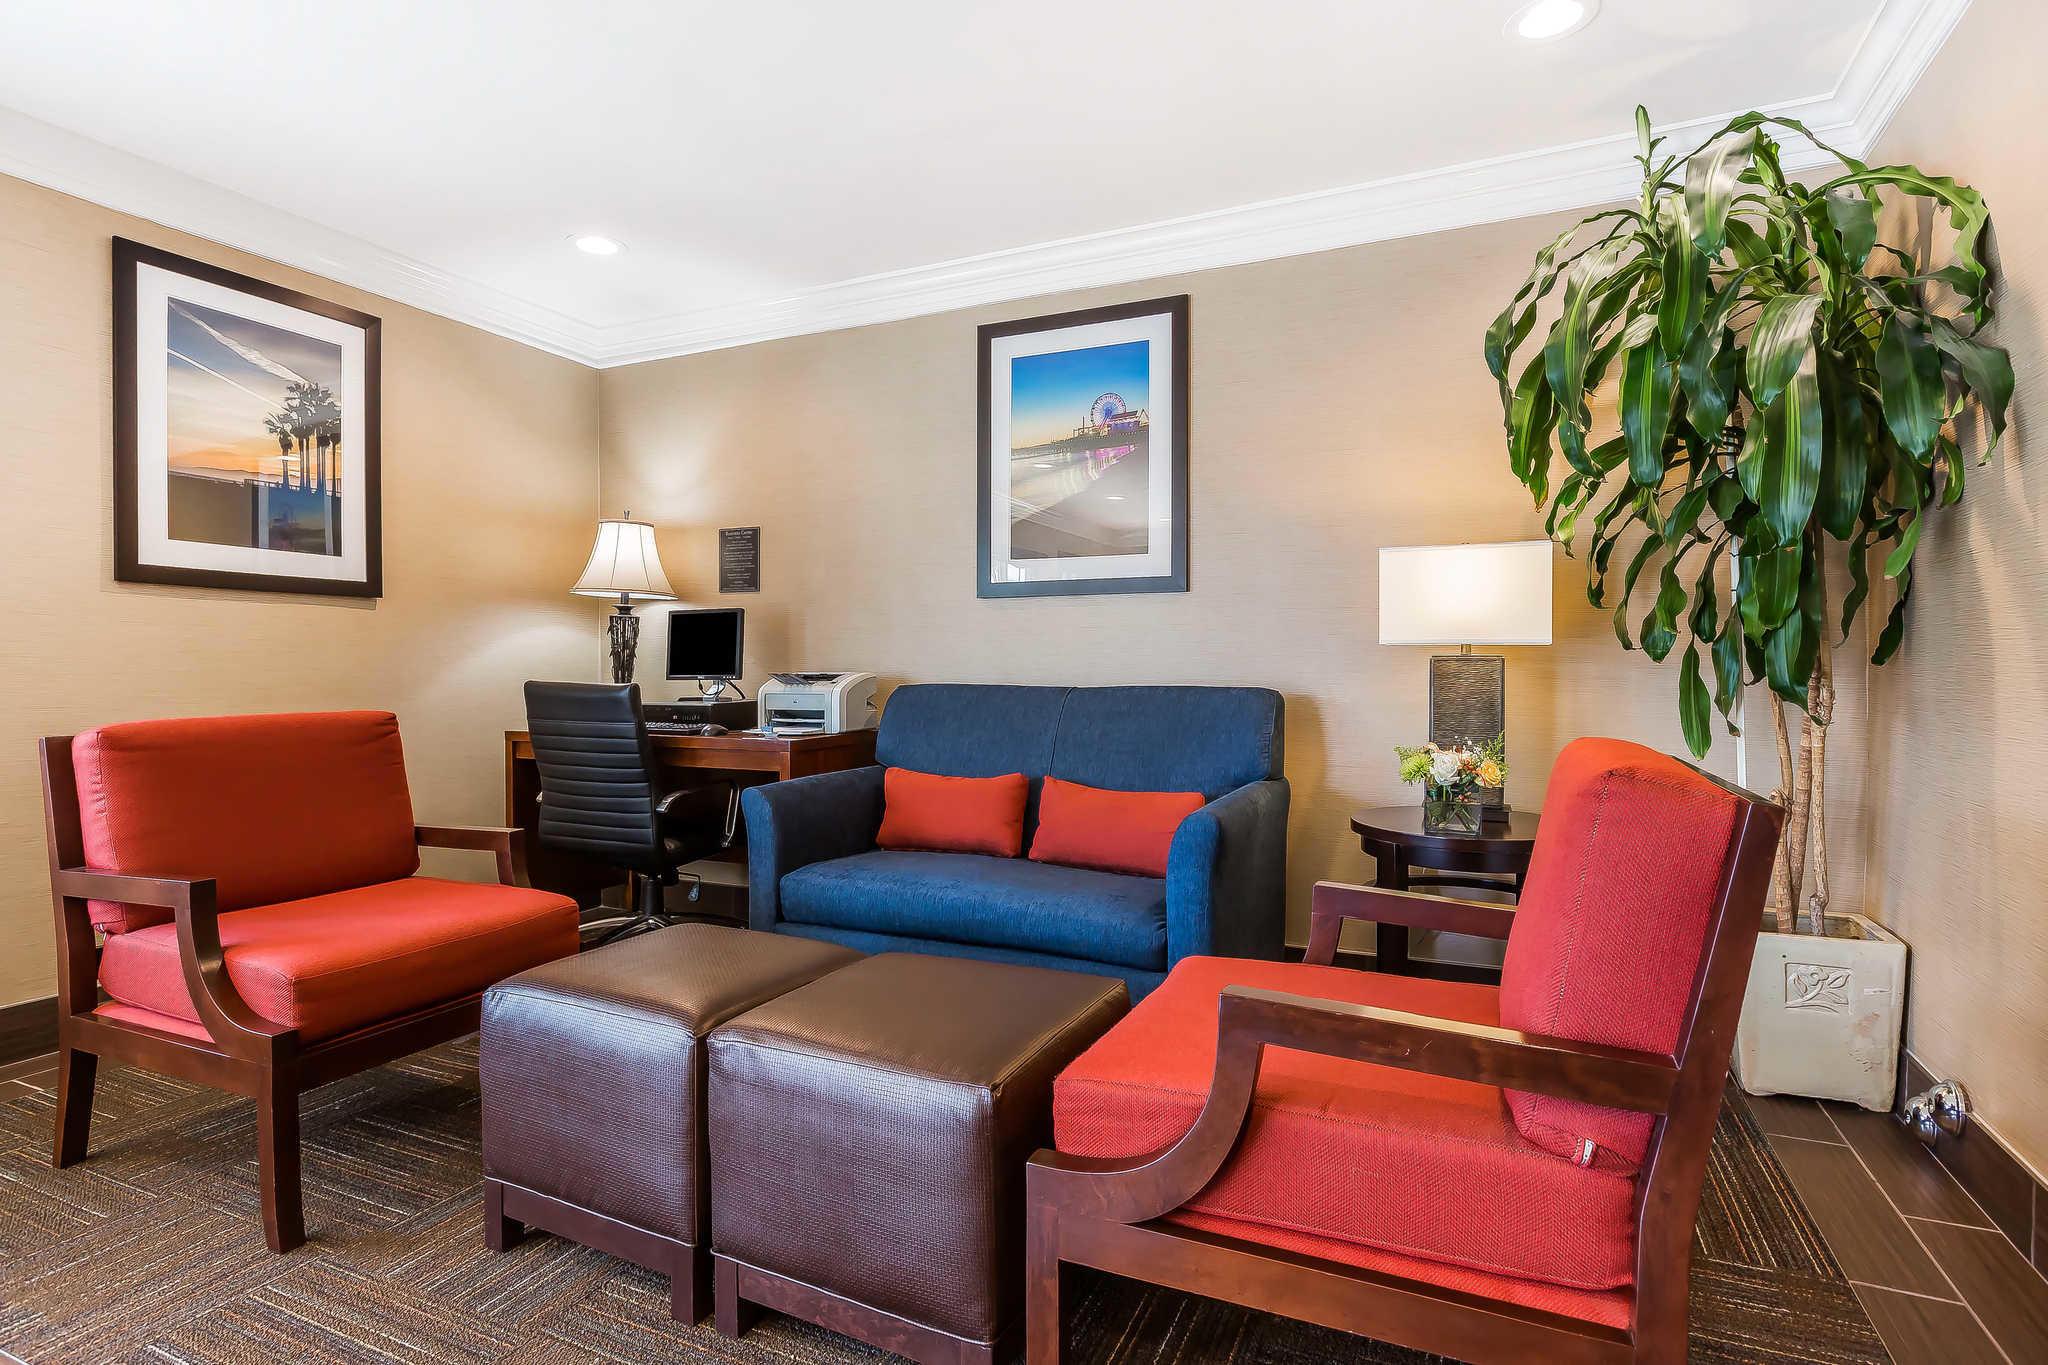 Comfort Inn Santa Monica - West Los Angeles image 5